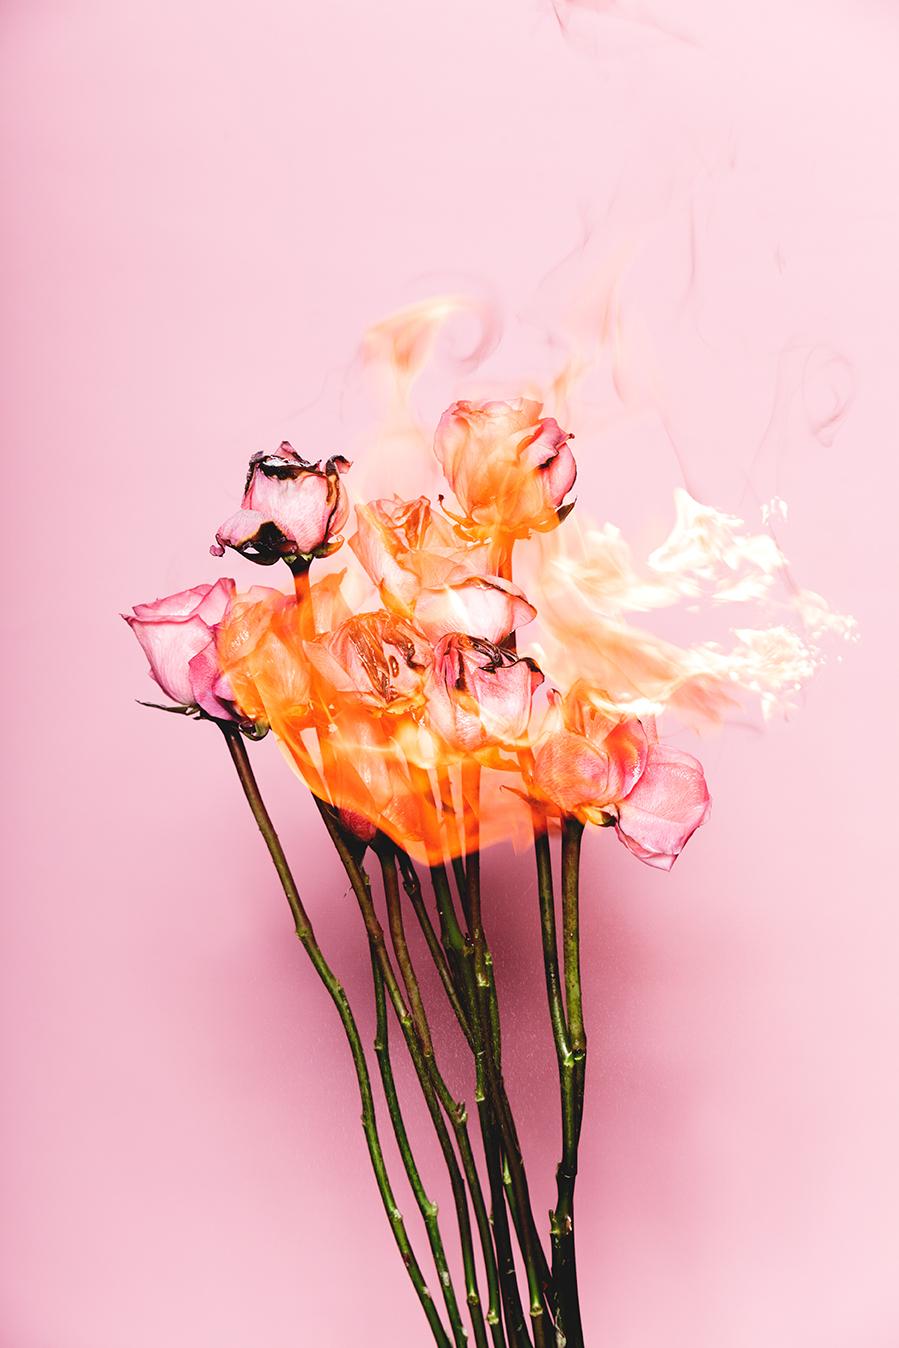 pinkroses_01_o.jpg